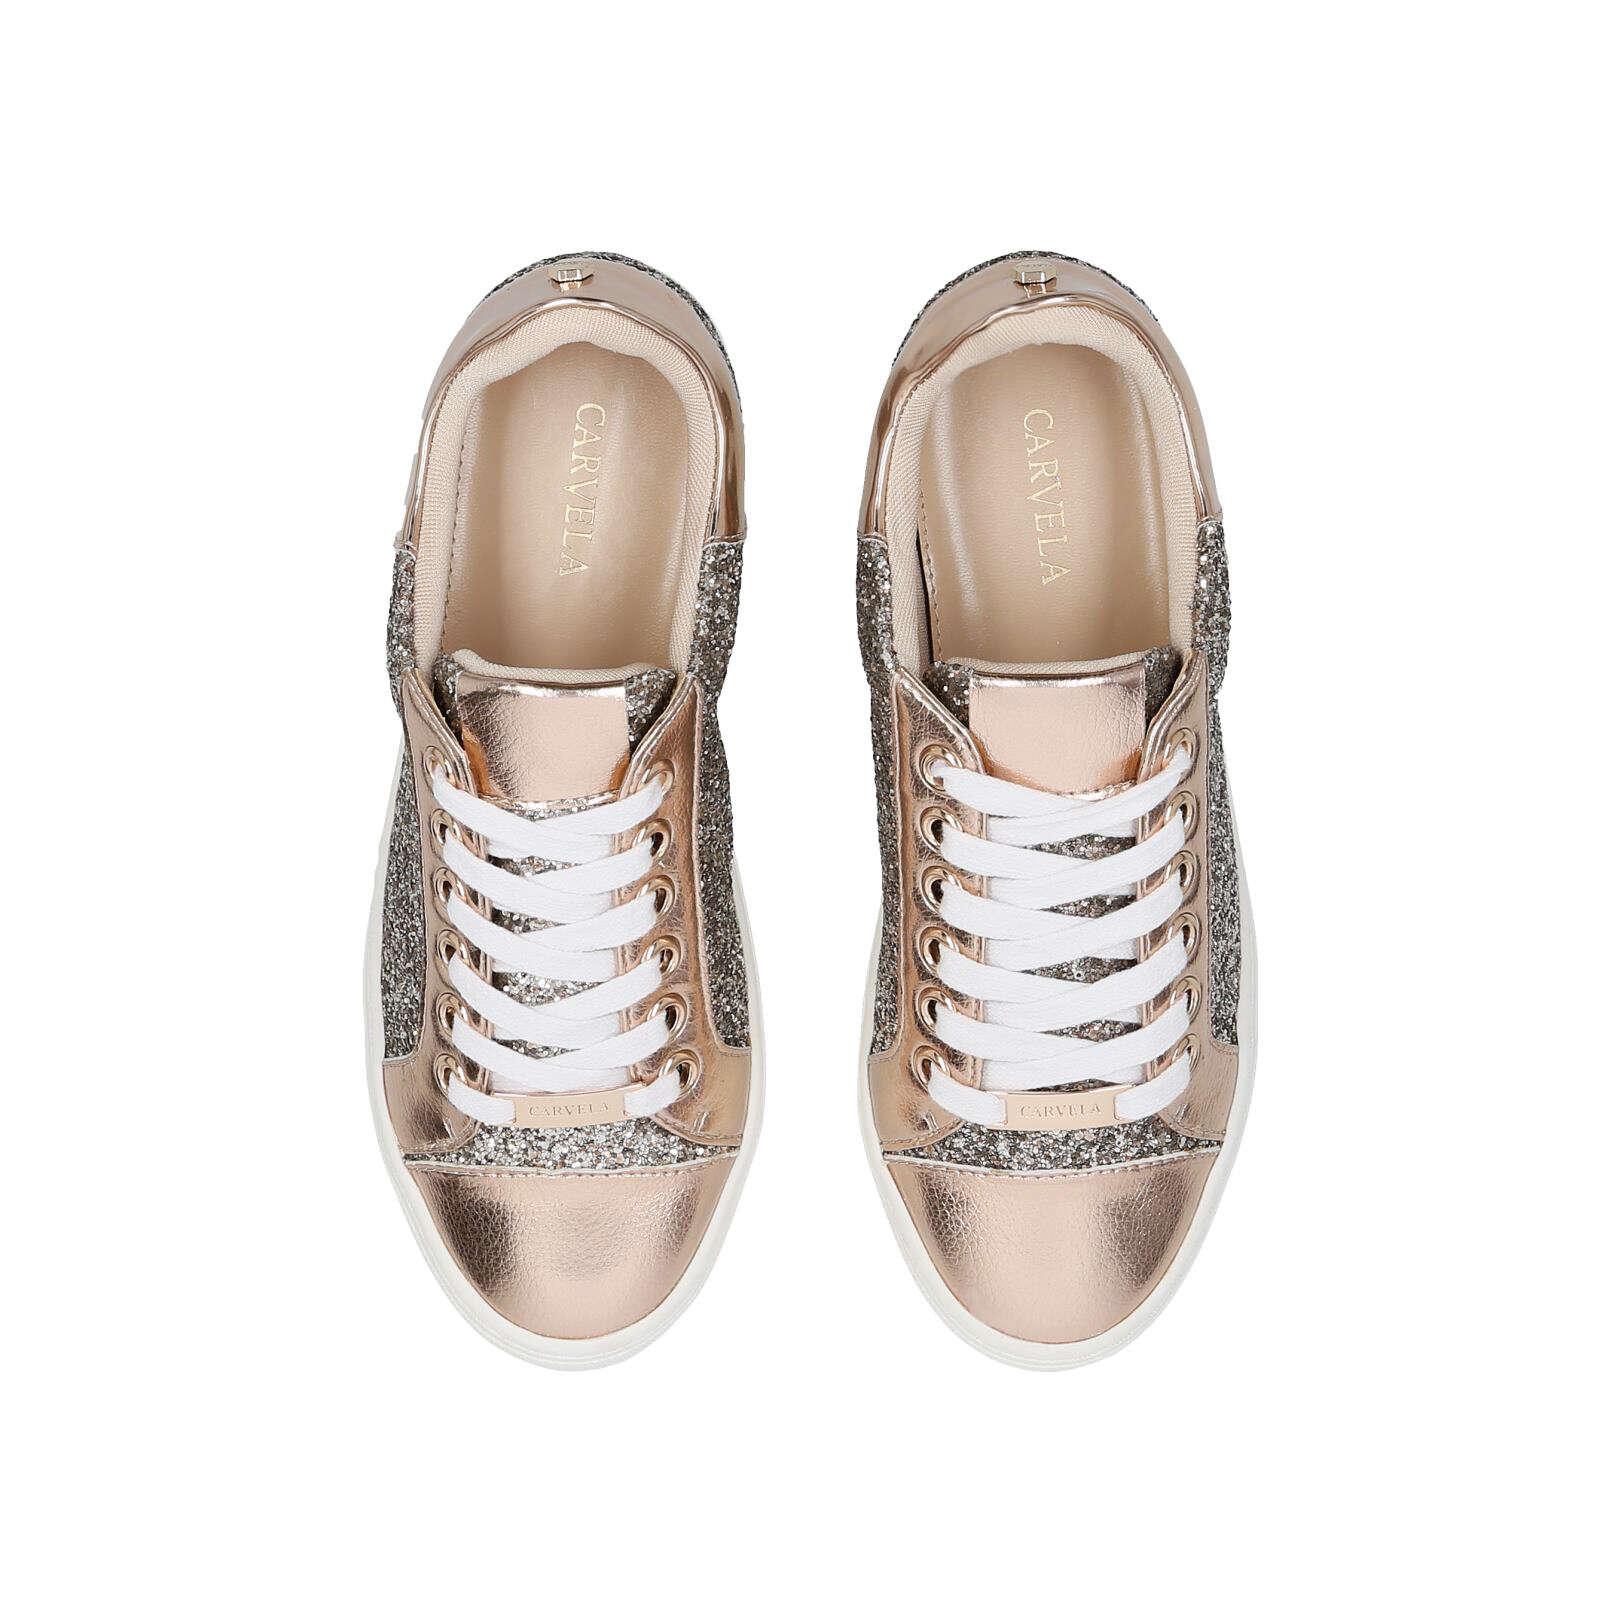 JUDD - CARVELA Sneakers